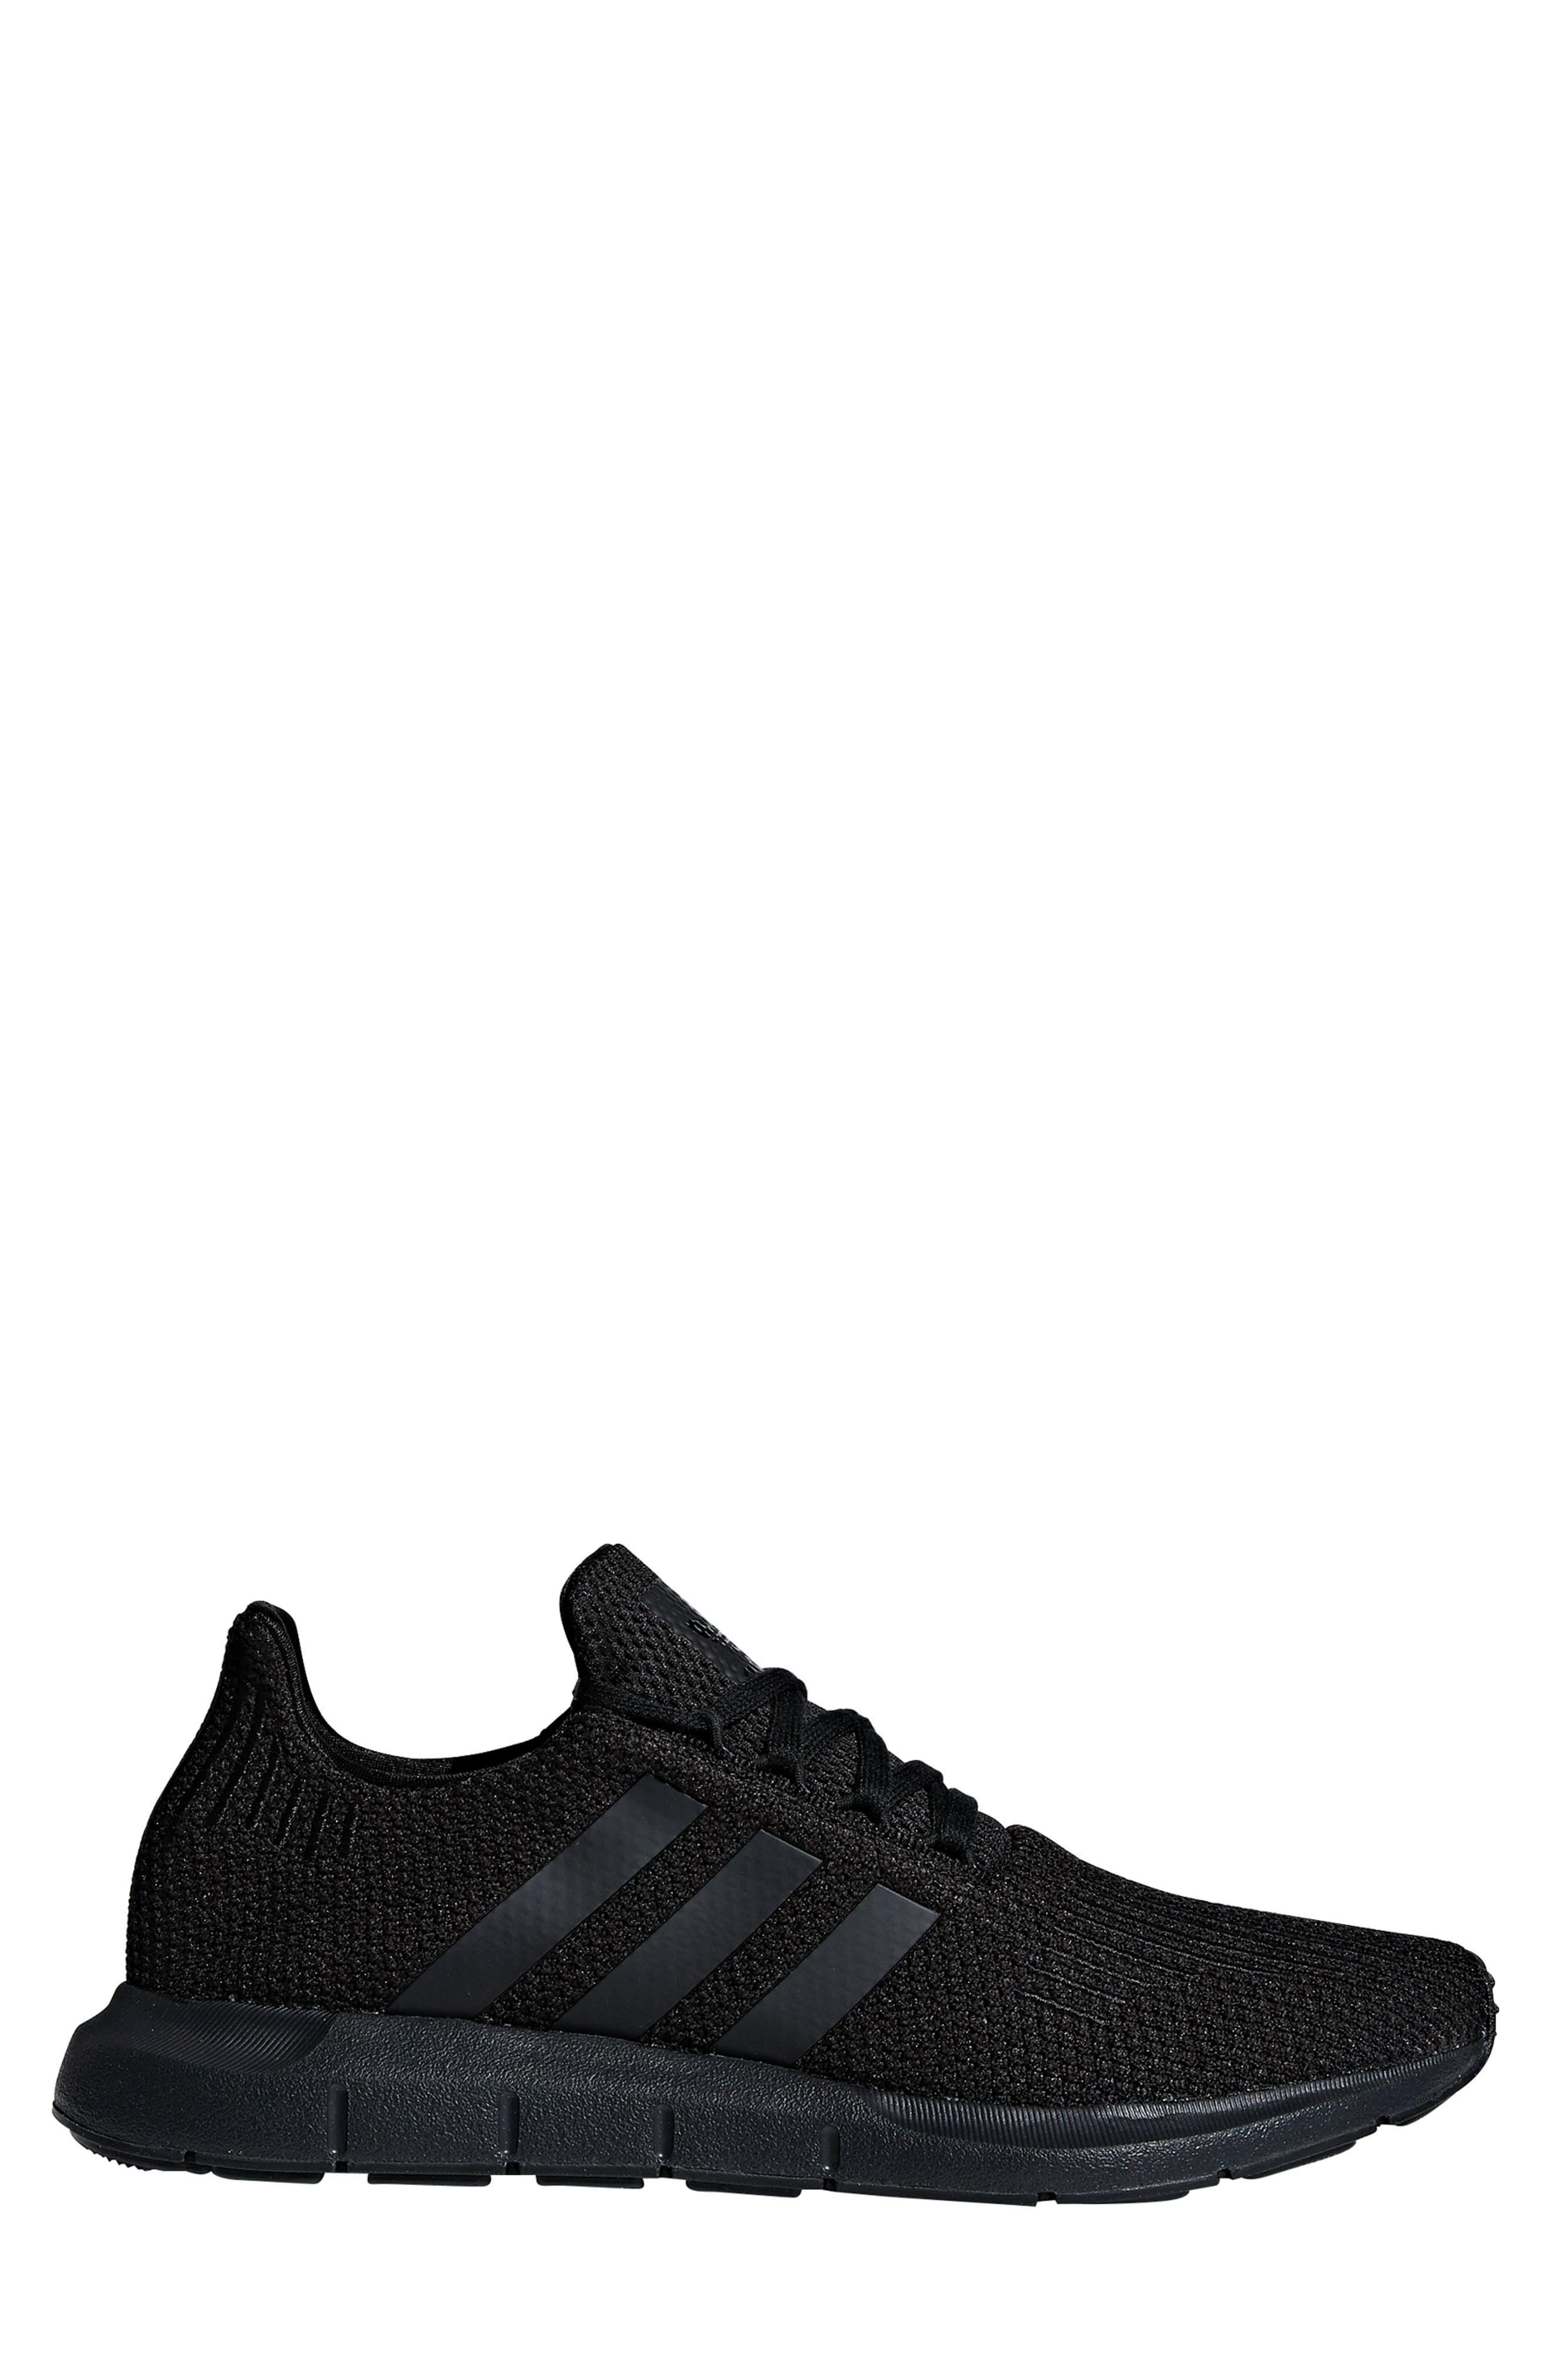 3634ea0ac62c3 Adidas Originals Swift Run Running Shoe In Core Black  Core Black  White